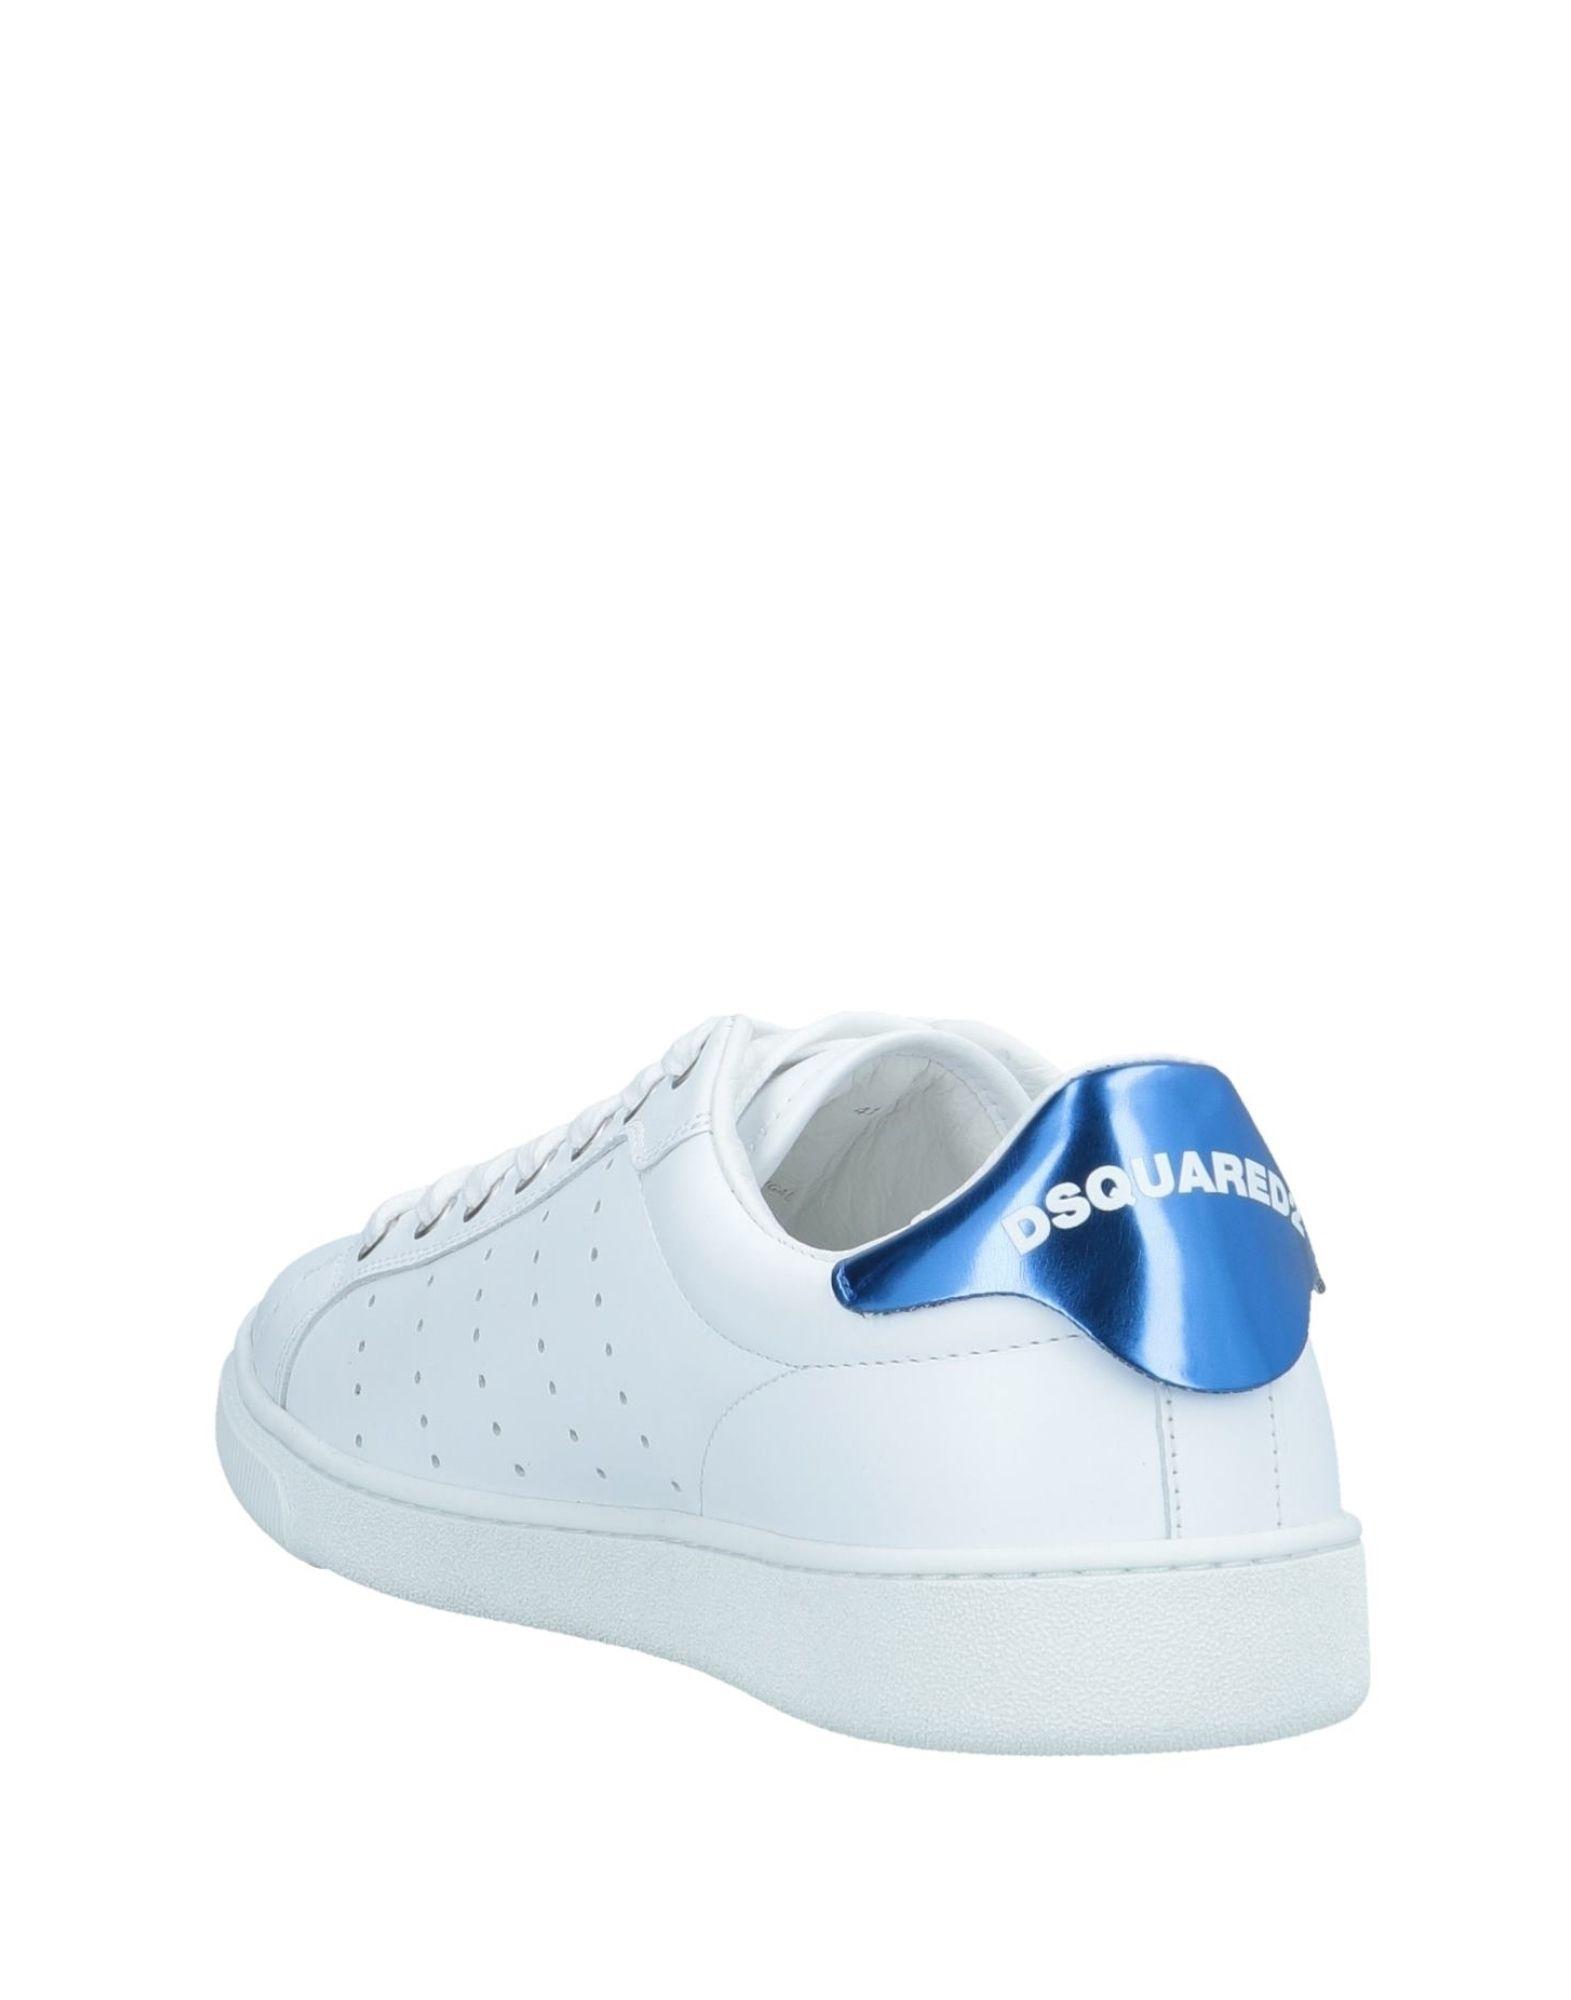 Dsquared2 Sneakers 11558569GNGut Damen  11558569GNGut Sneakers aussehende strapazierfähige Schuhe 99d196